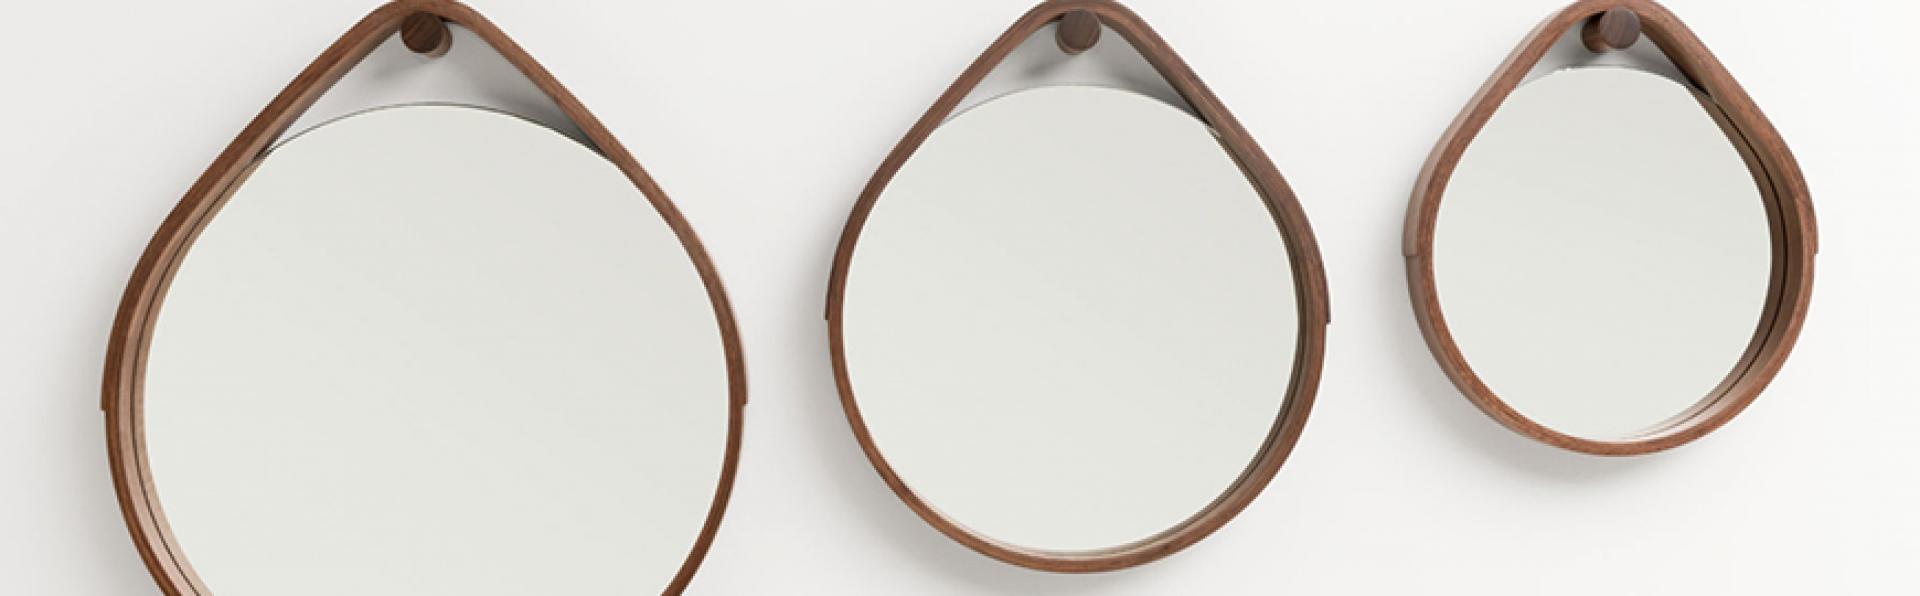 Oak Wall Mirror Furniture